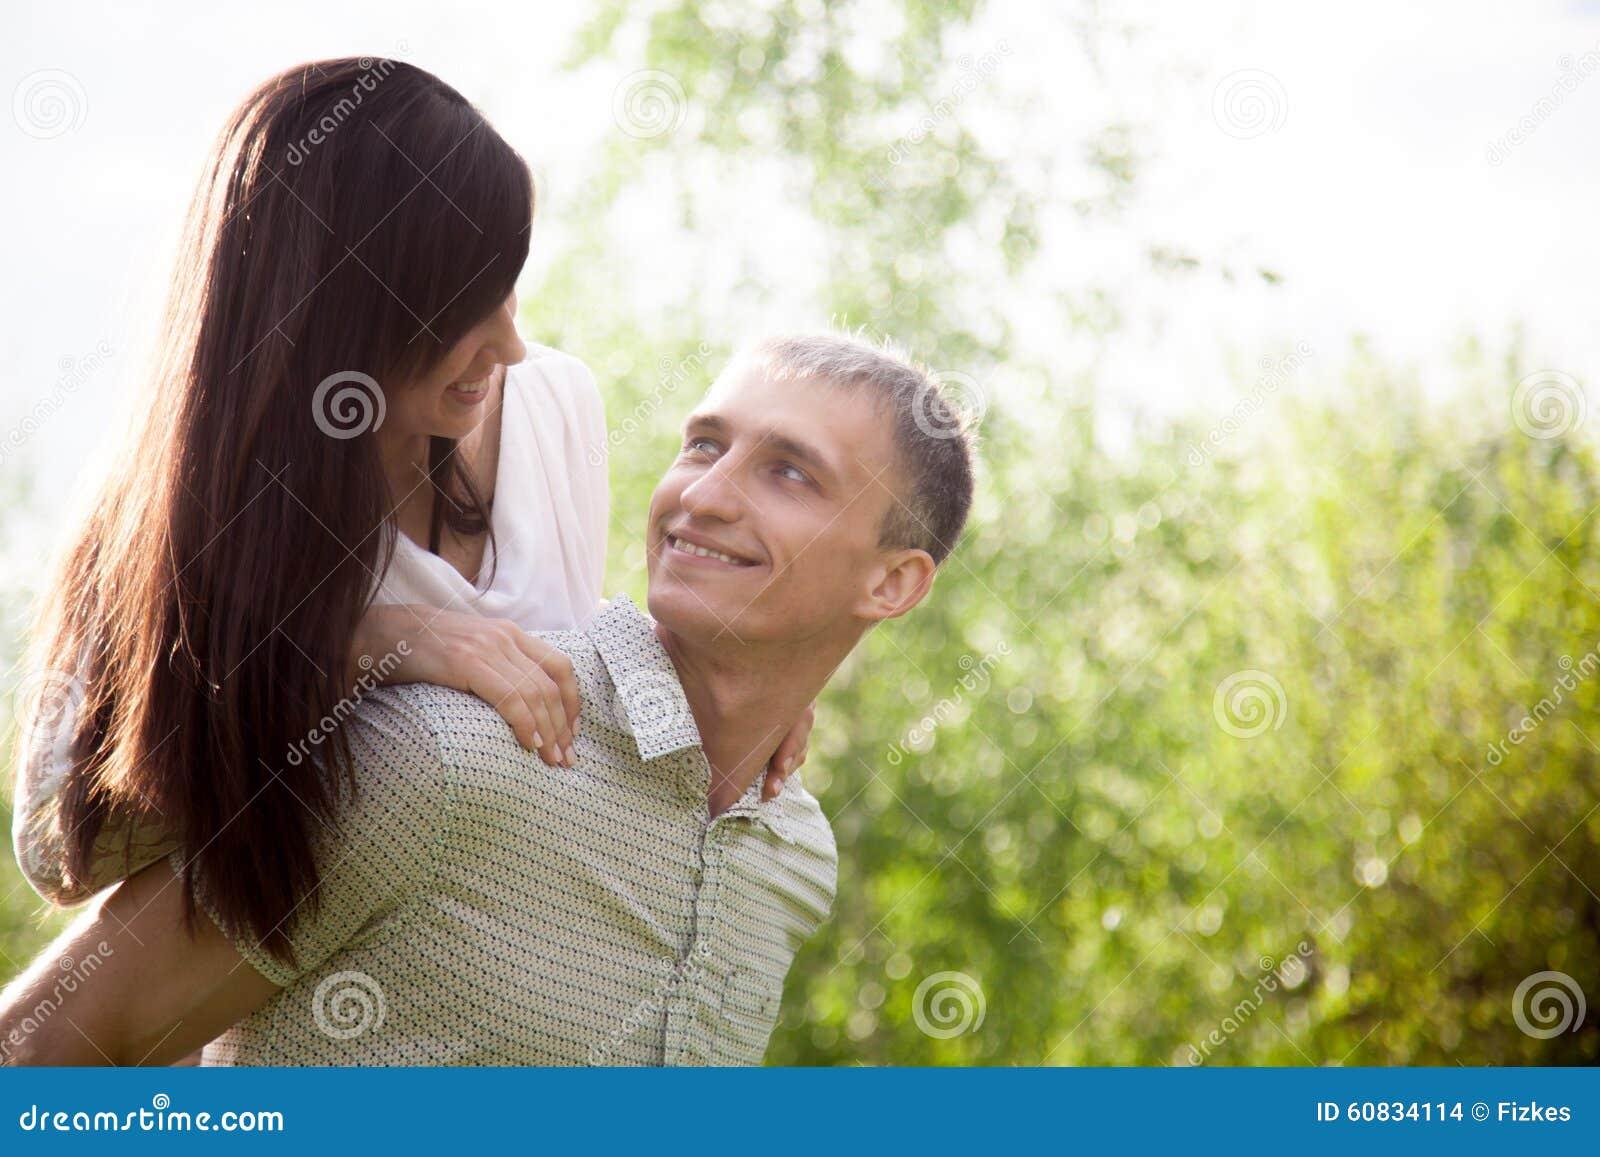 Young man carrying piggyback his girlfriend